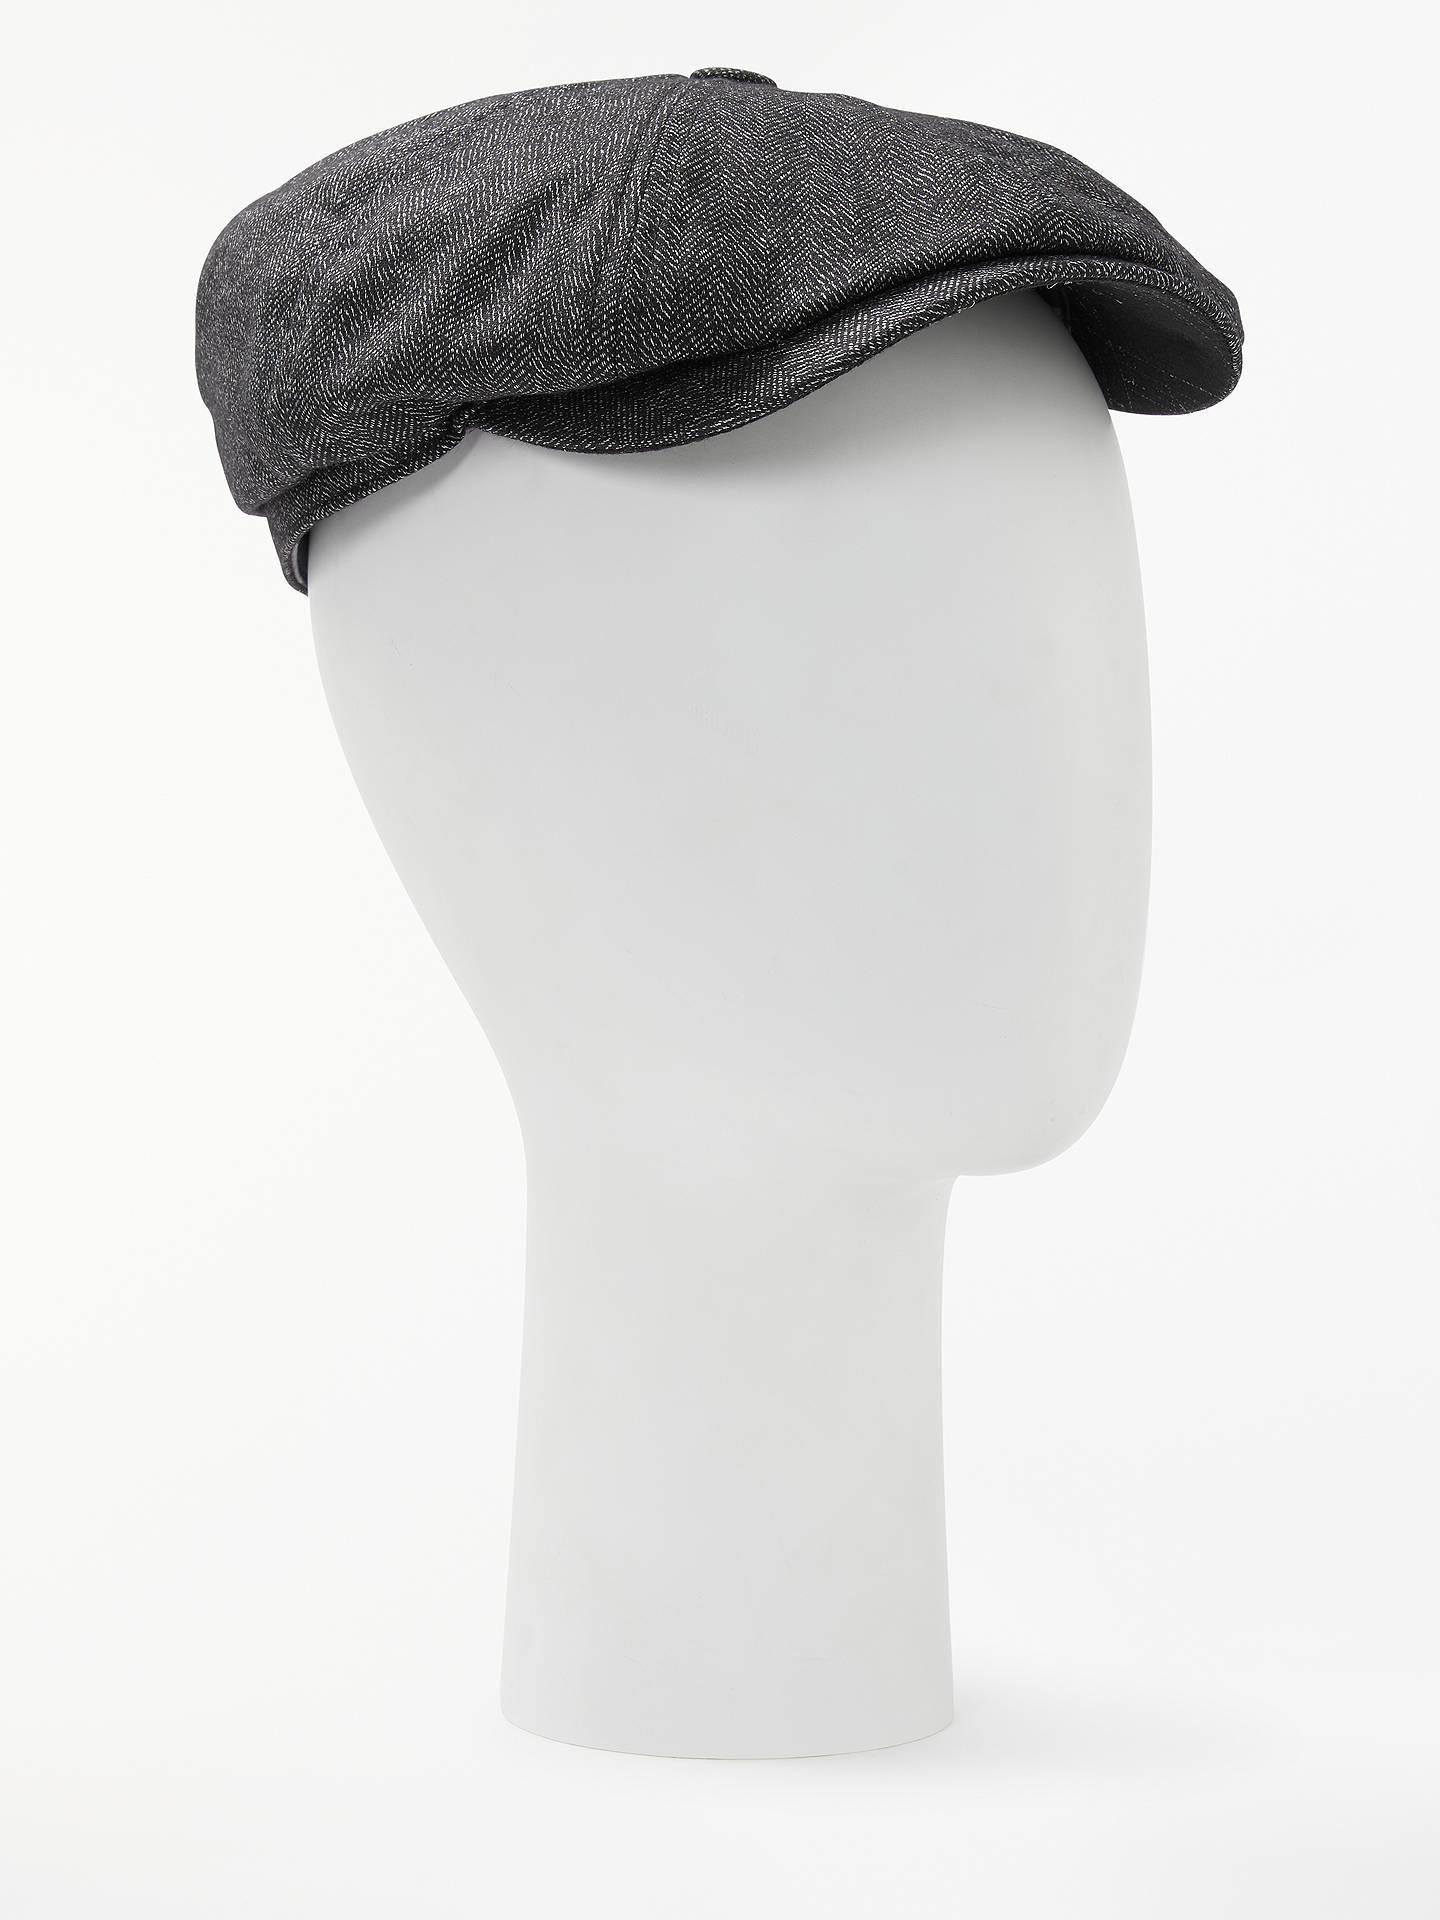 24a0d0c3e43 BuyTed Baker Herringbone Baker Boy Hat